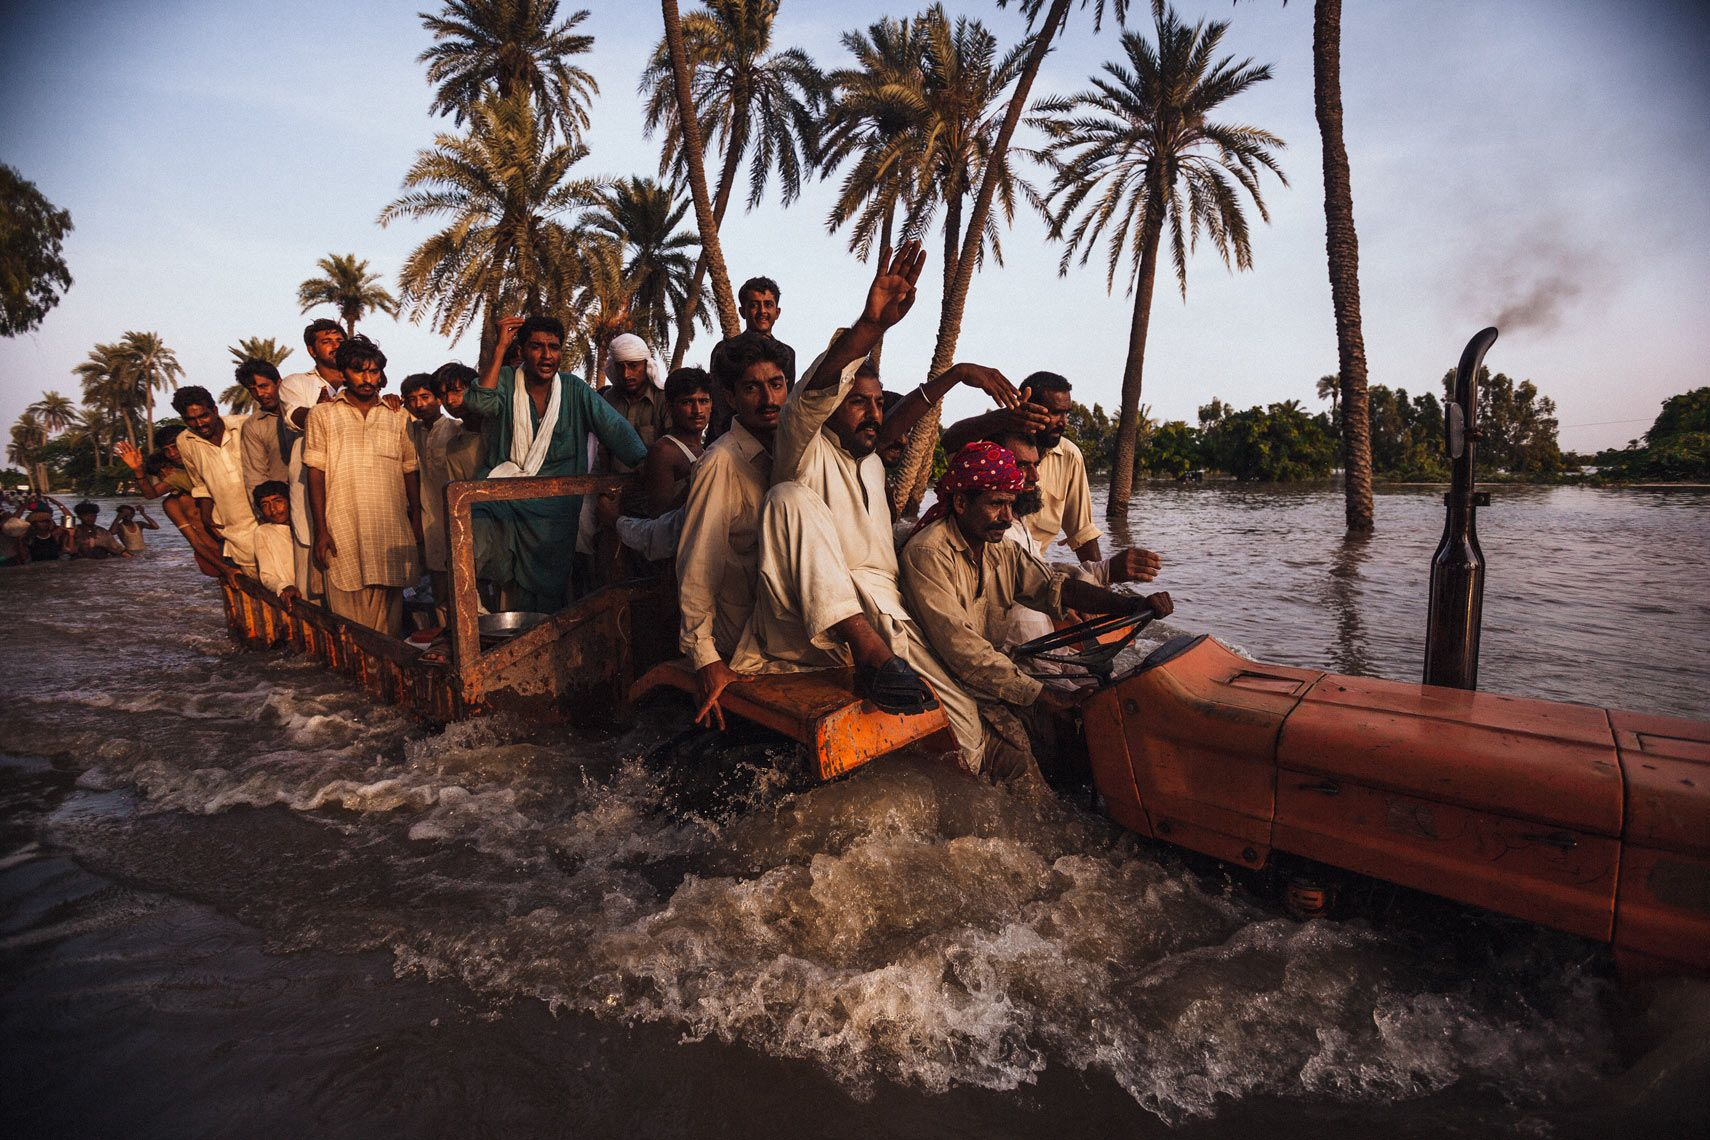 daniel berehulak - photojournalist | floods | 26